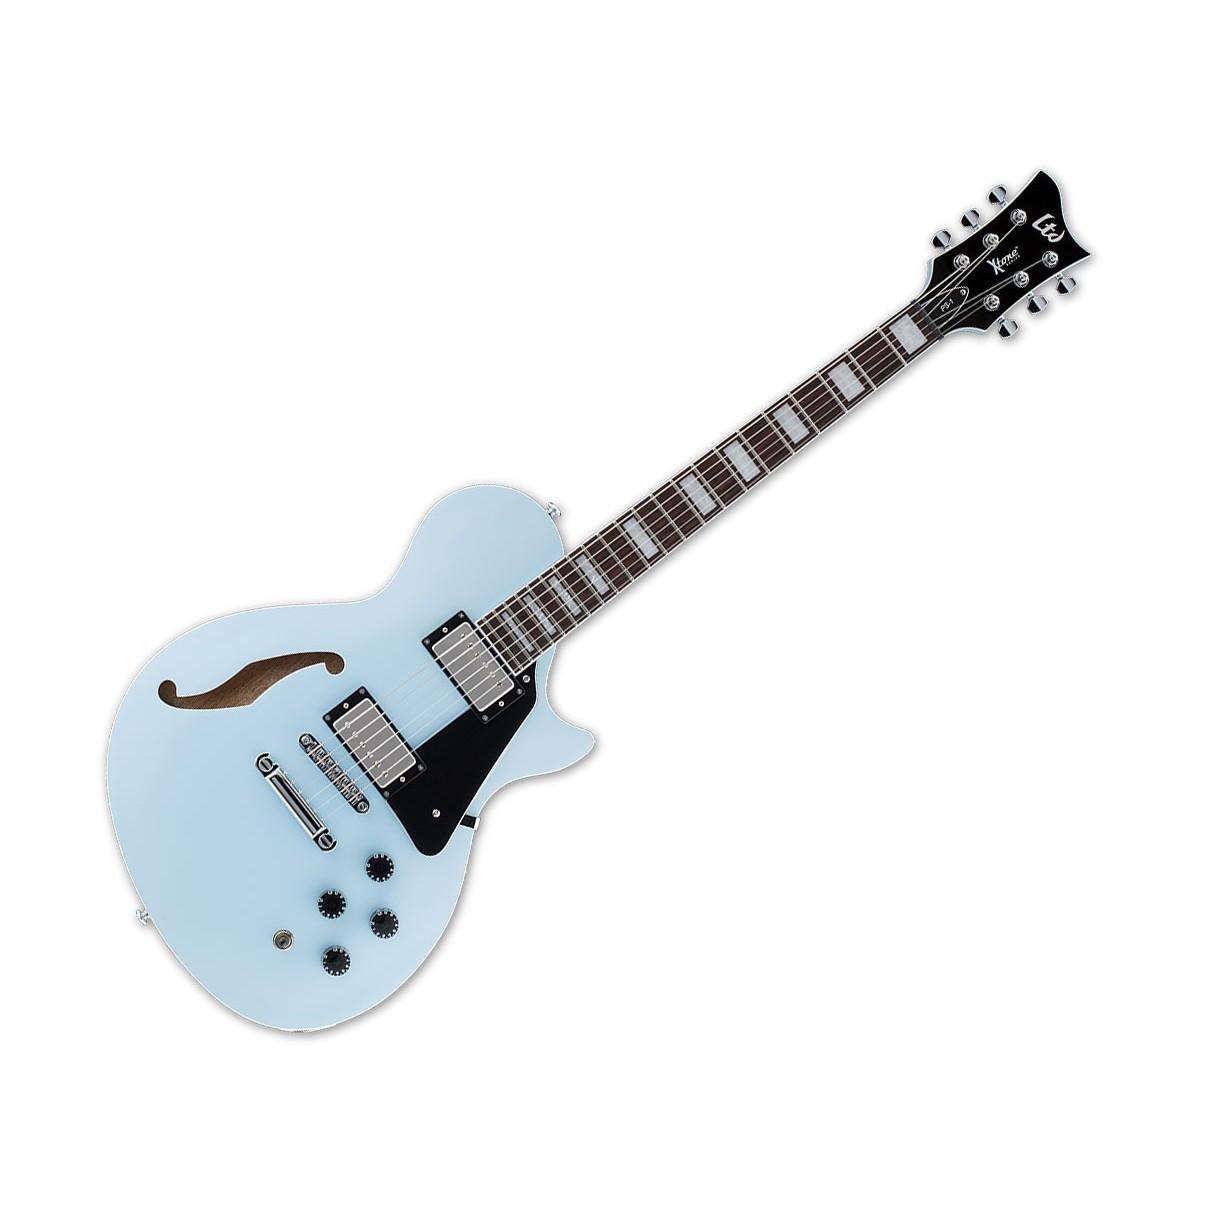 esp ltd x tone ps 1 semi hollowbody electric guitar sonic blue. Black Bedroom Furniture Sets. Home Design Ideas